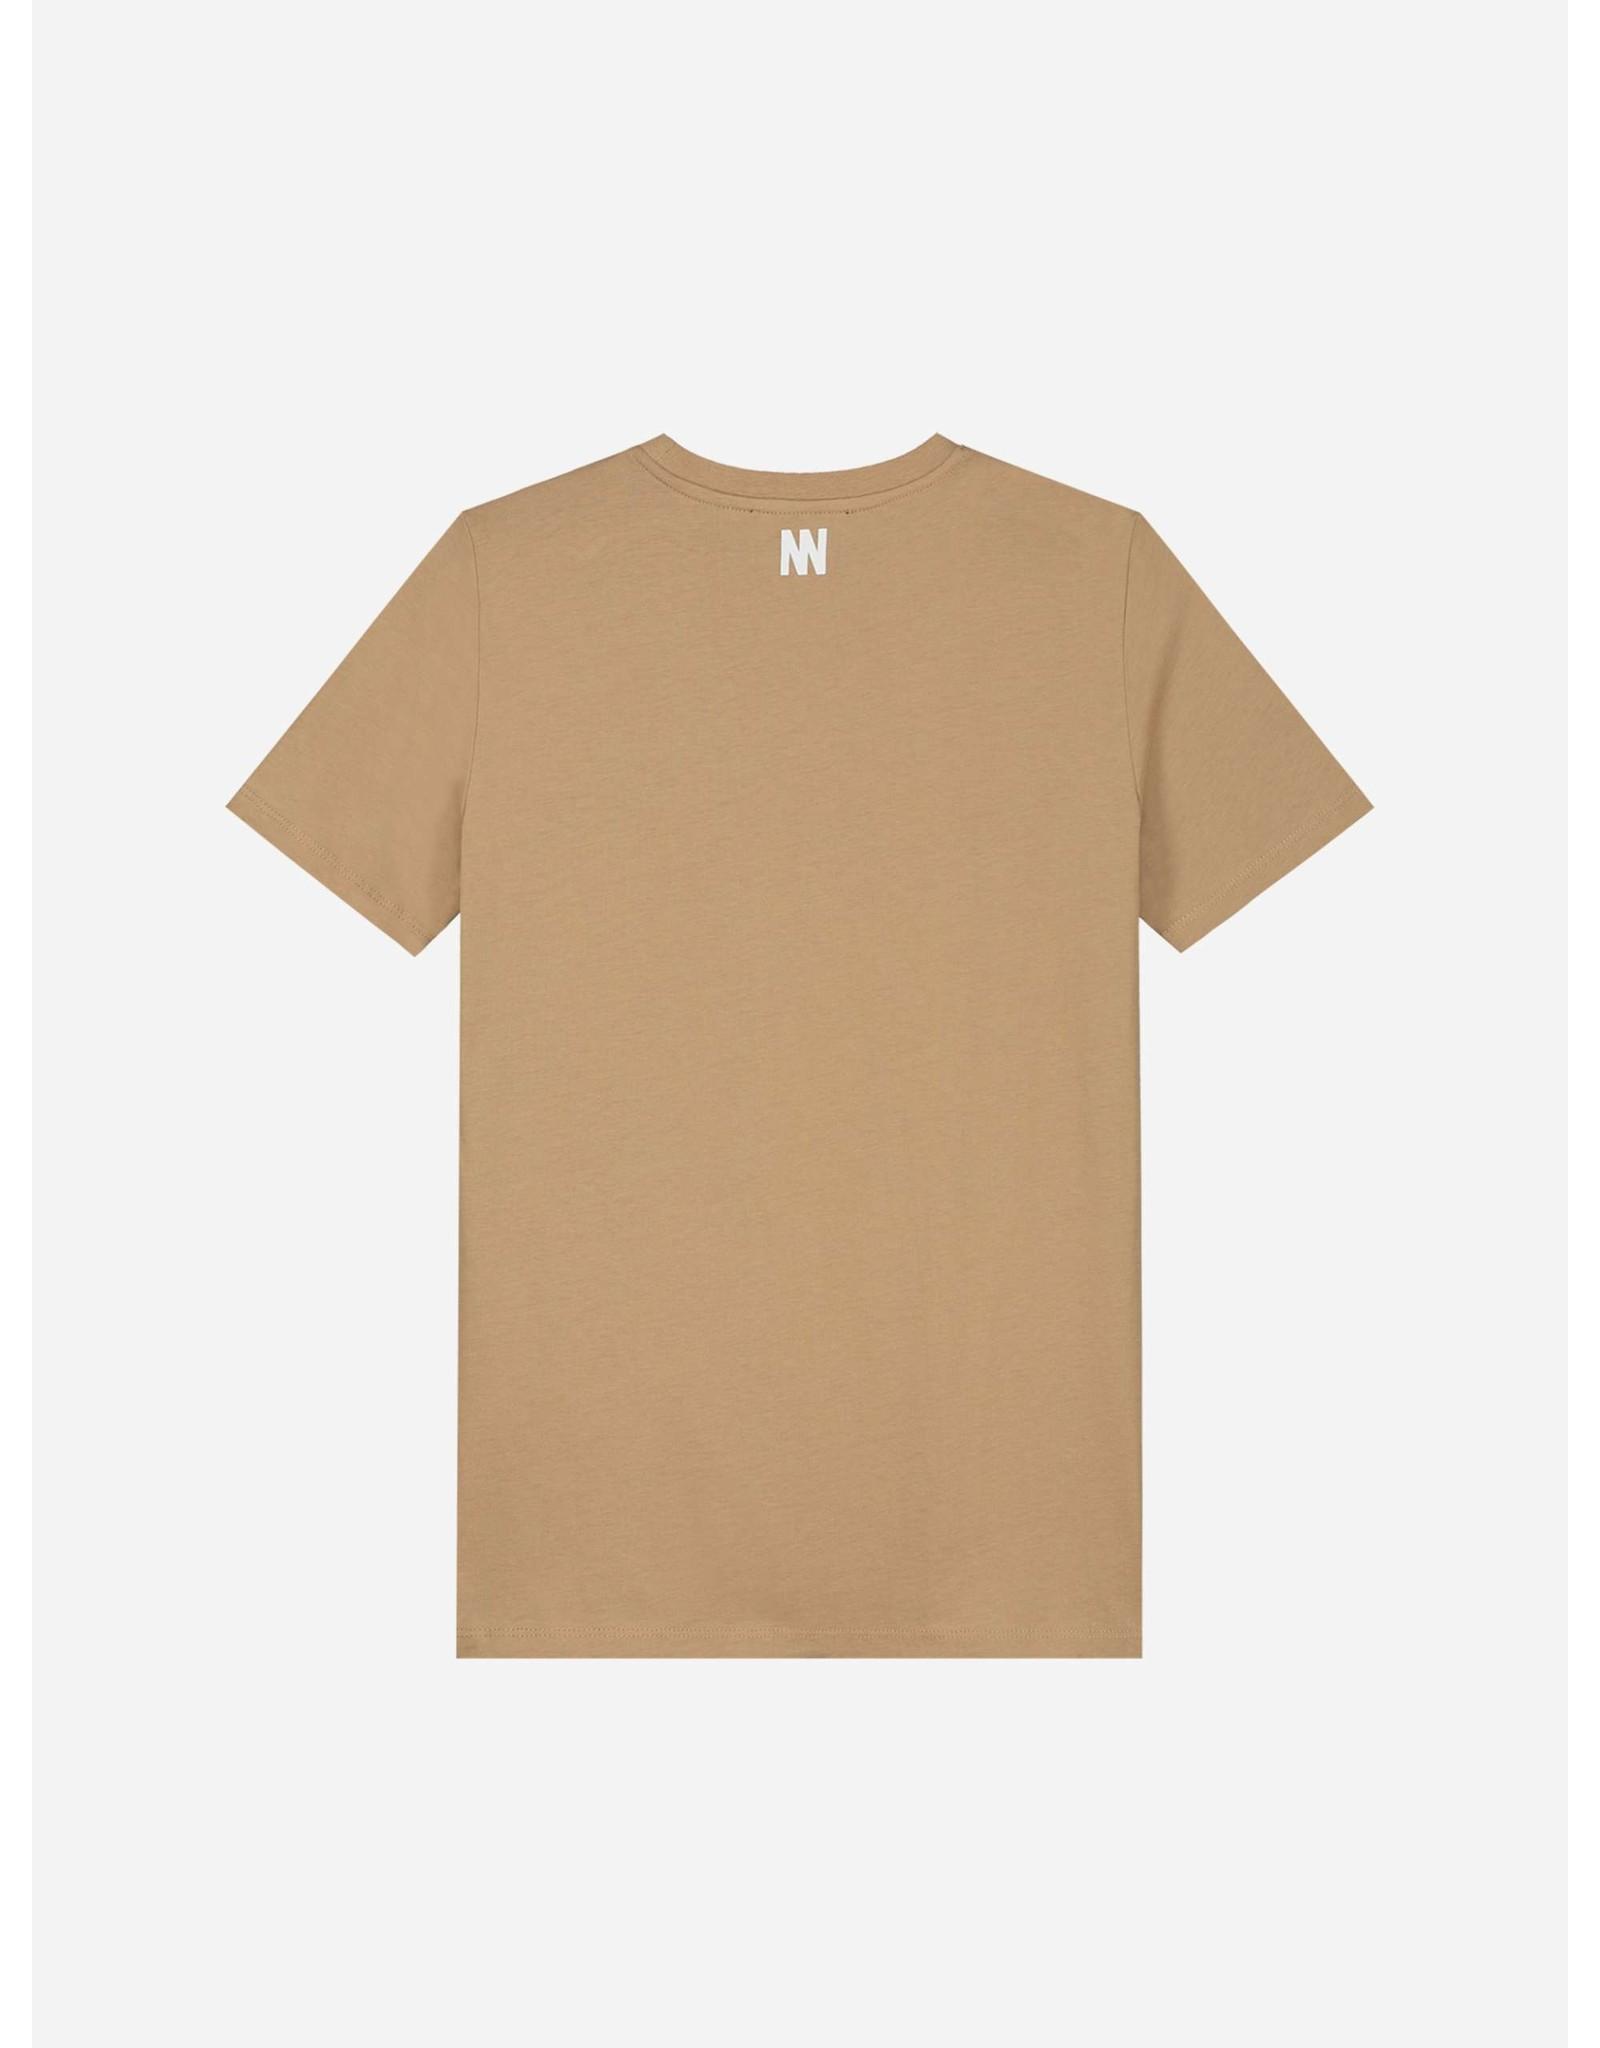 Nik&Nik NIK&NIK Wesley T-shirt Clay Beige